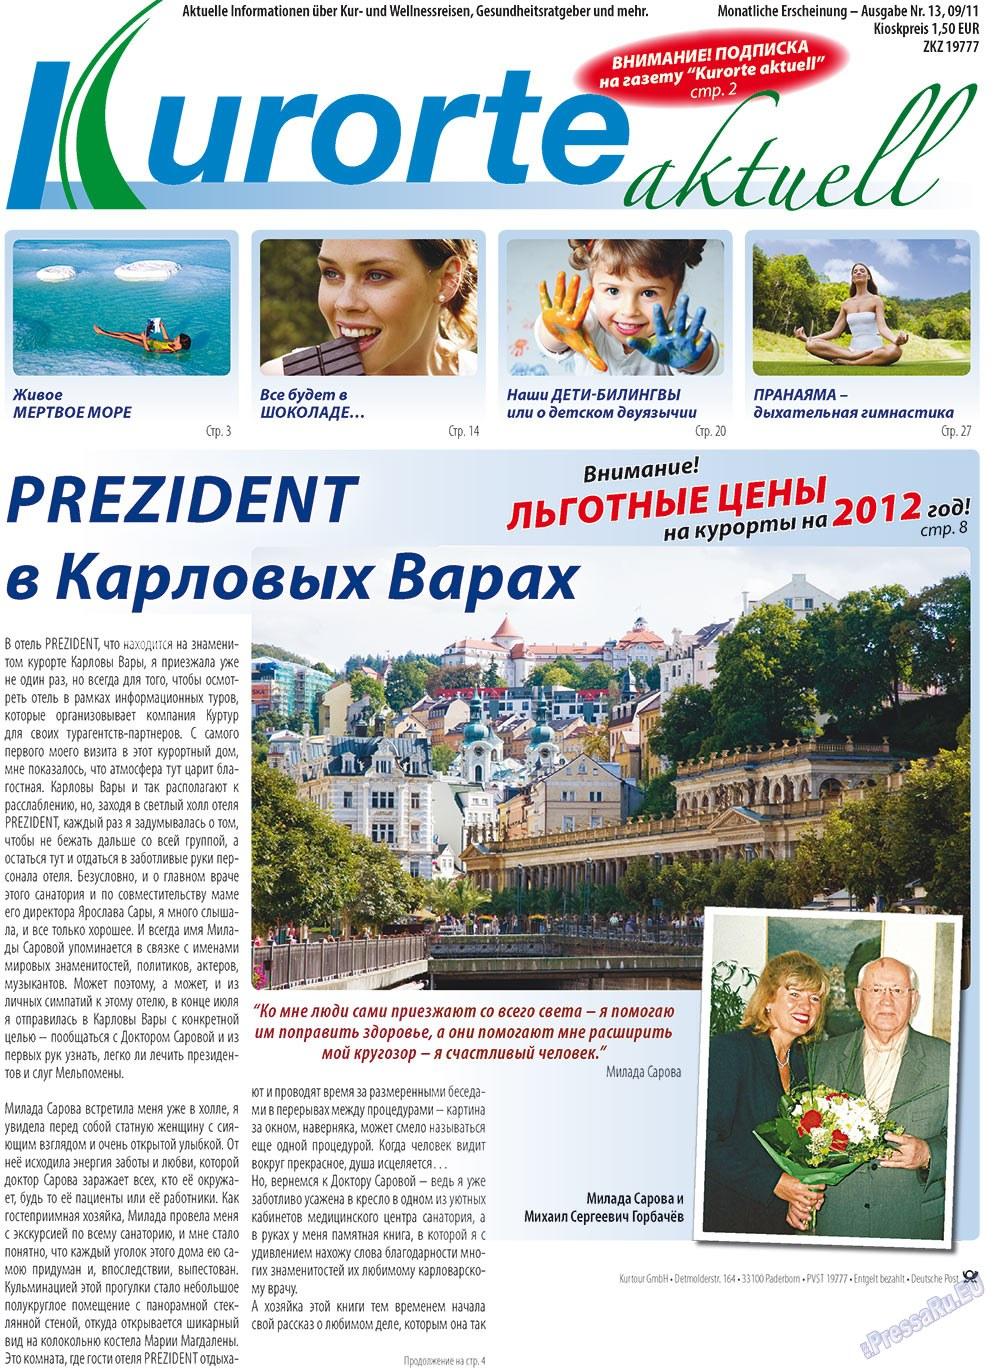 Kurorte aktuell (газета). 2011 год, номер 9, стр. 1